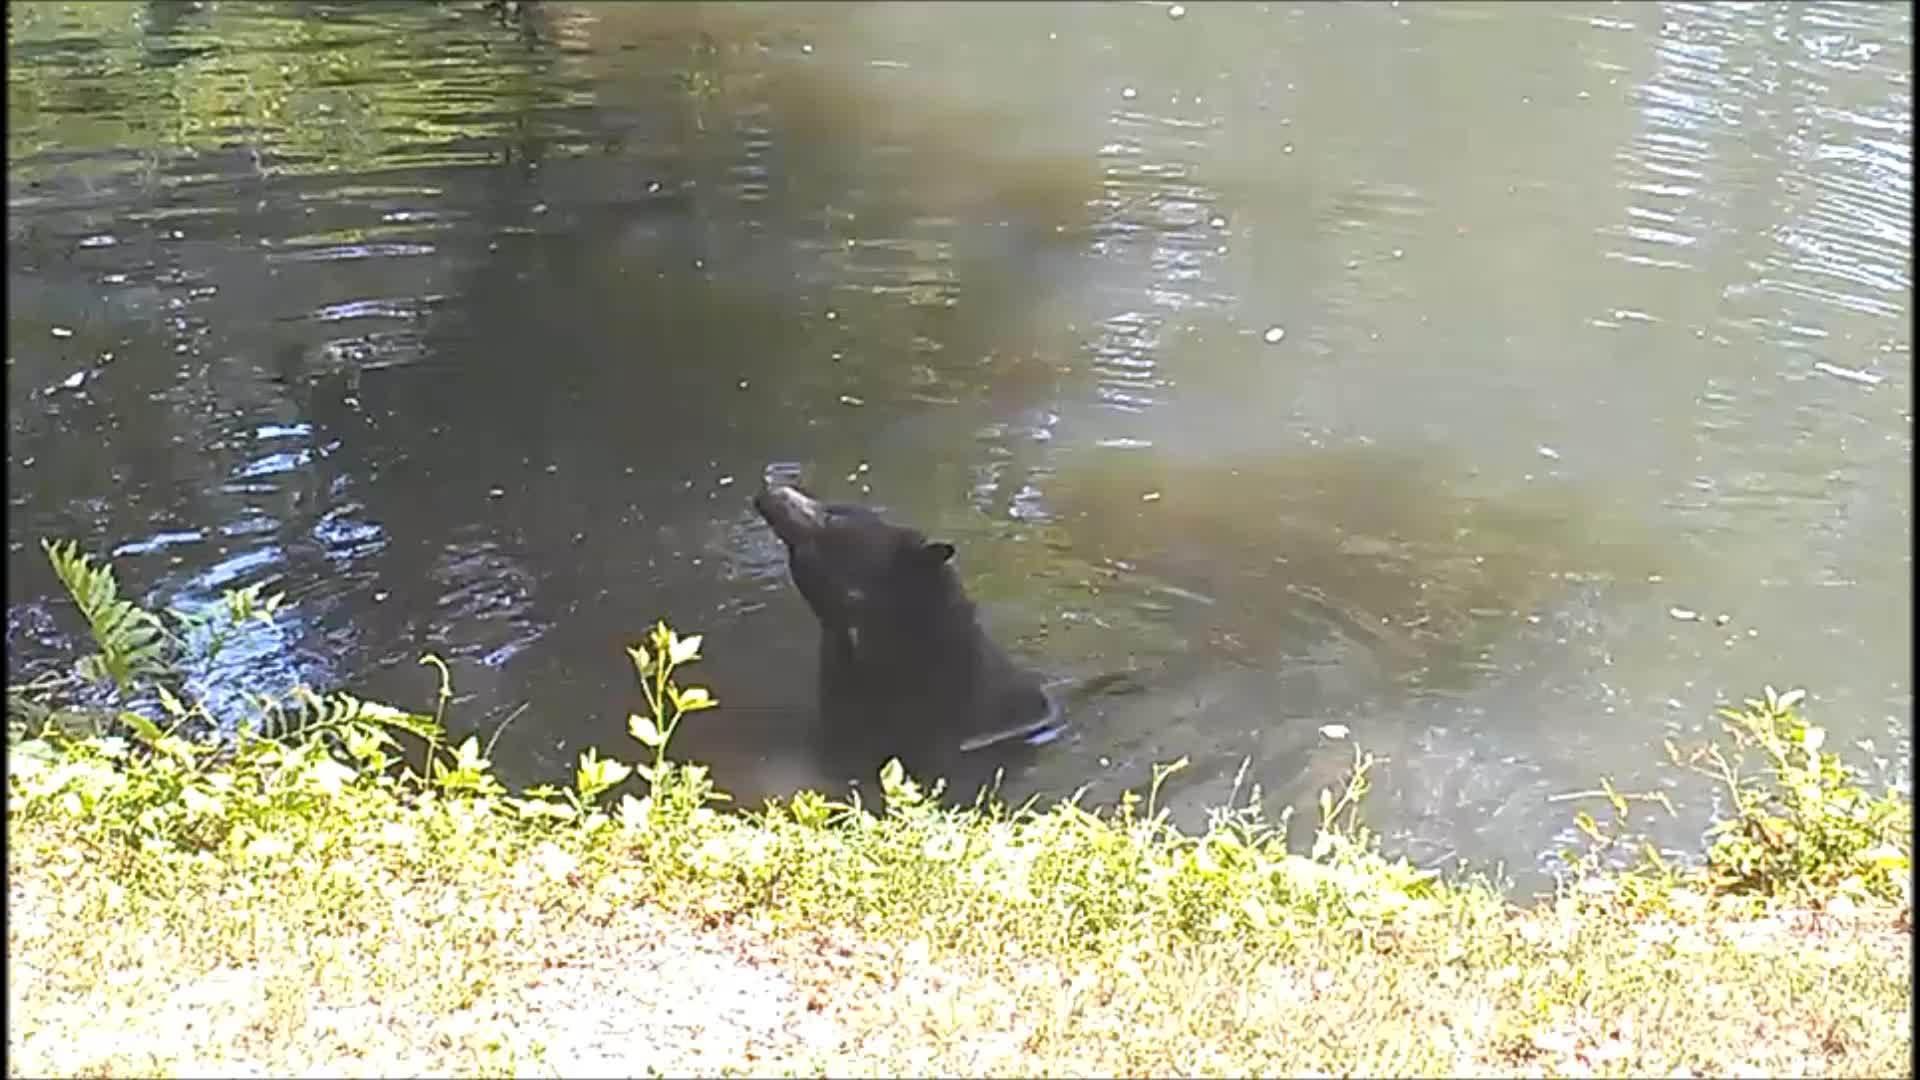 hardcoreaww, likeus, Black bear cooling off in the water (reddit) GIFs